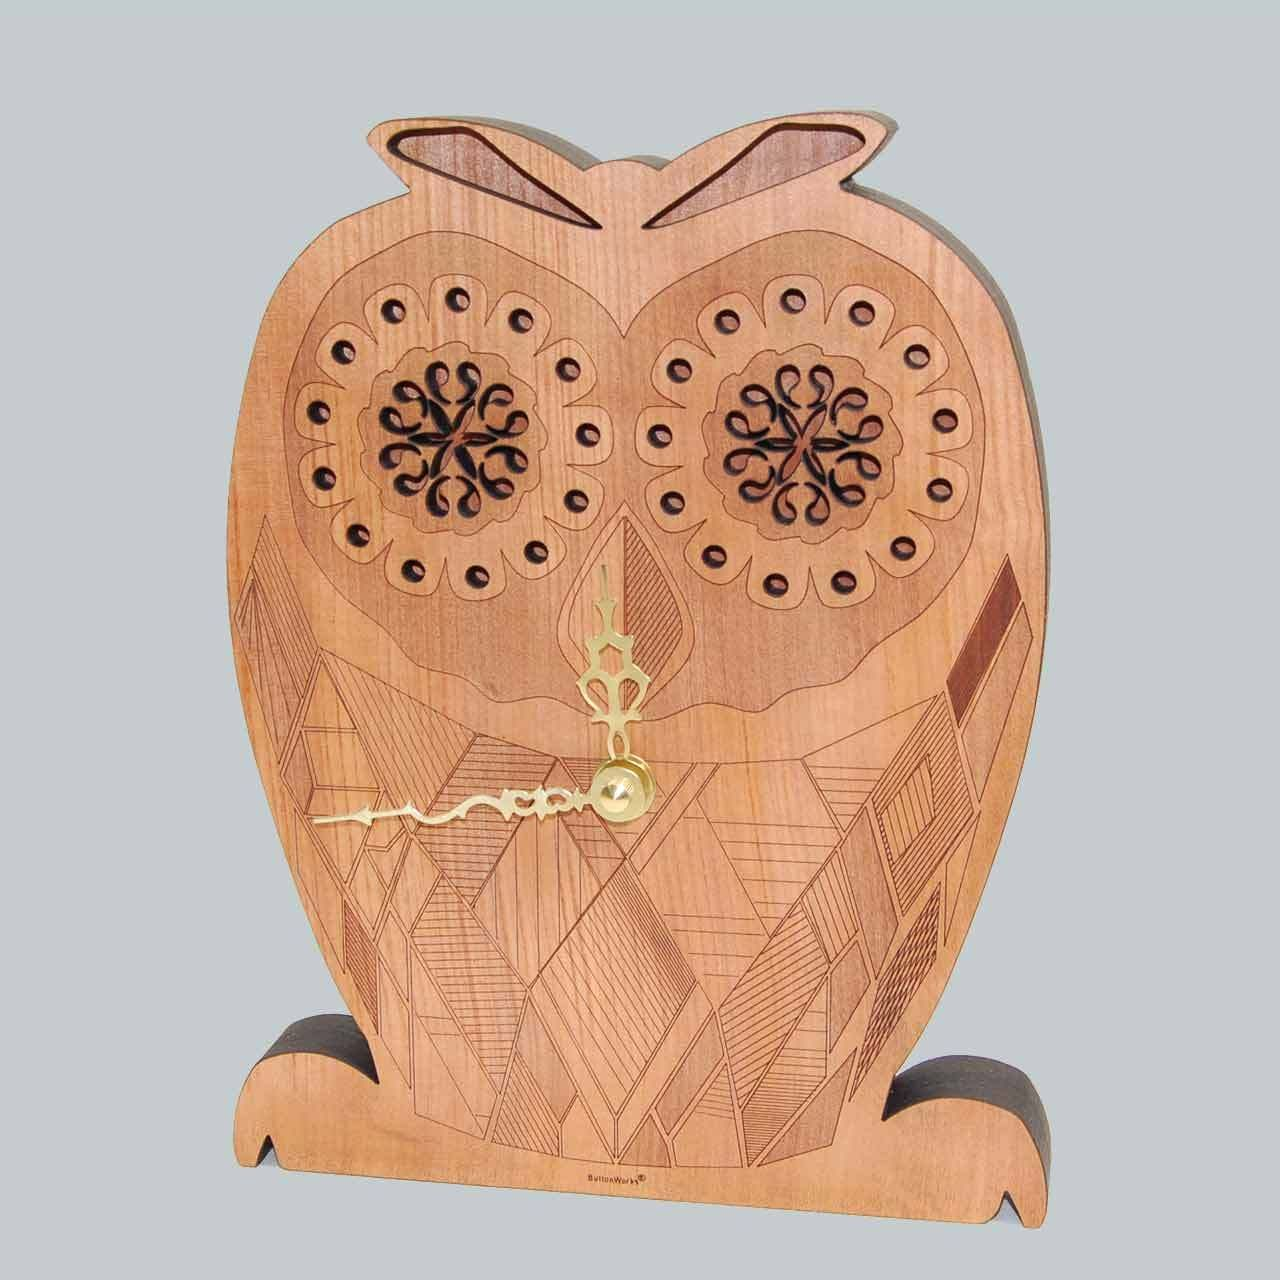 Wooden owl clock cute folky girls wall clock gifts and wooden owl clock cute folky girls wall clock amipublicfo Choice Image